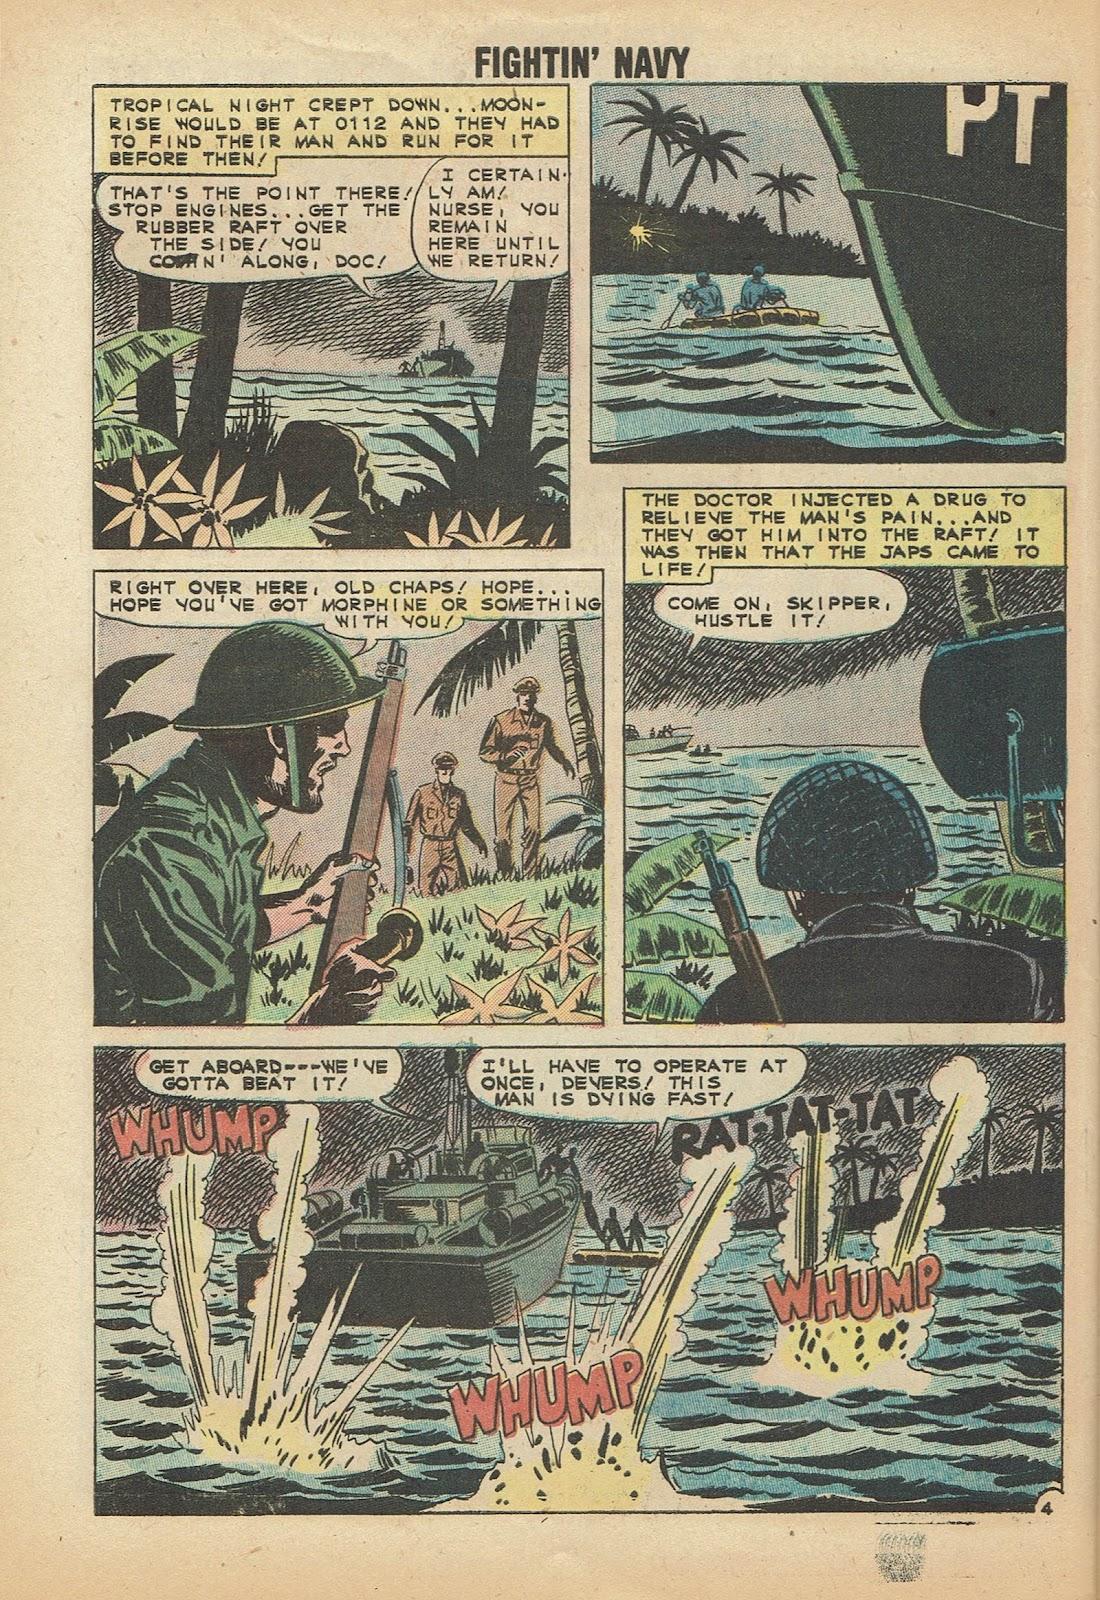 Read online Fightin' Navy comic -  Issue #97 - 32